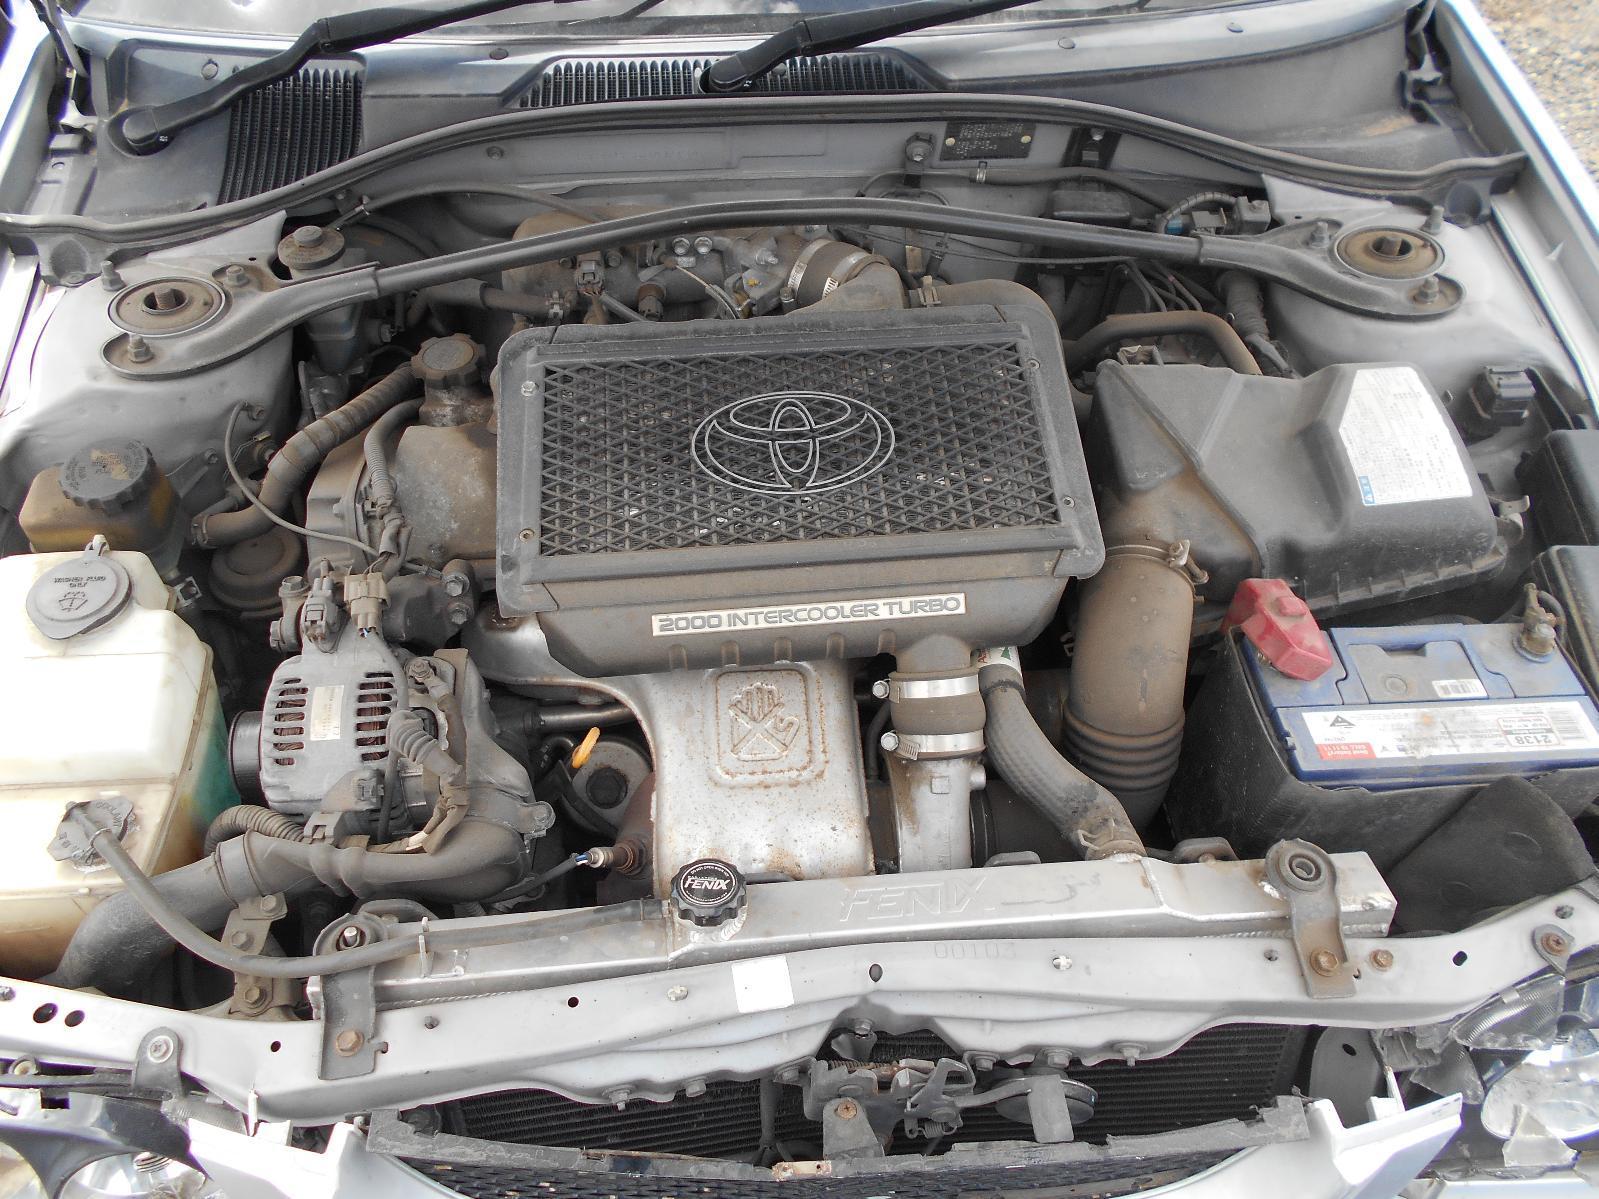 TOYOTA CALDINA, Engine, PETROL, 2.0, 3S-GTE, TURBO, T210, 08/97-09/02 (IMPORT)